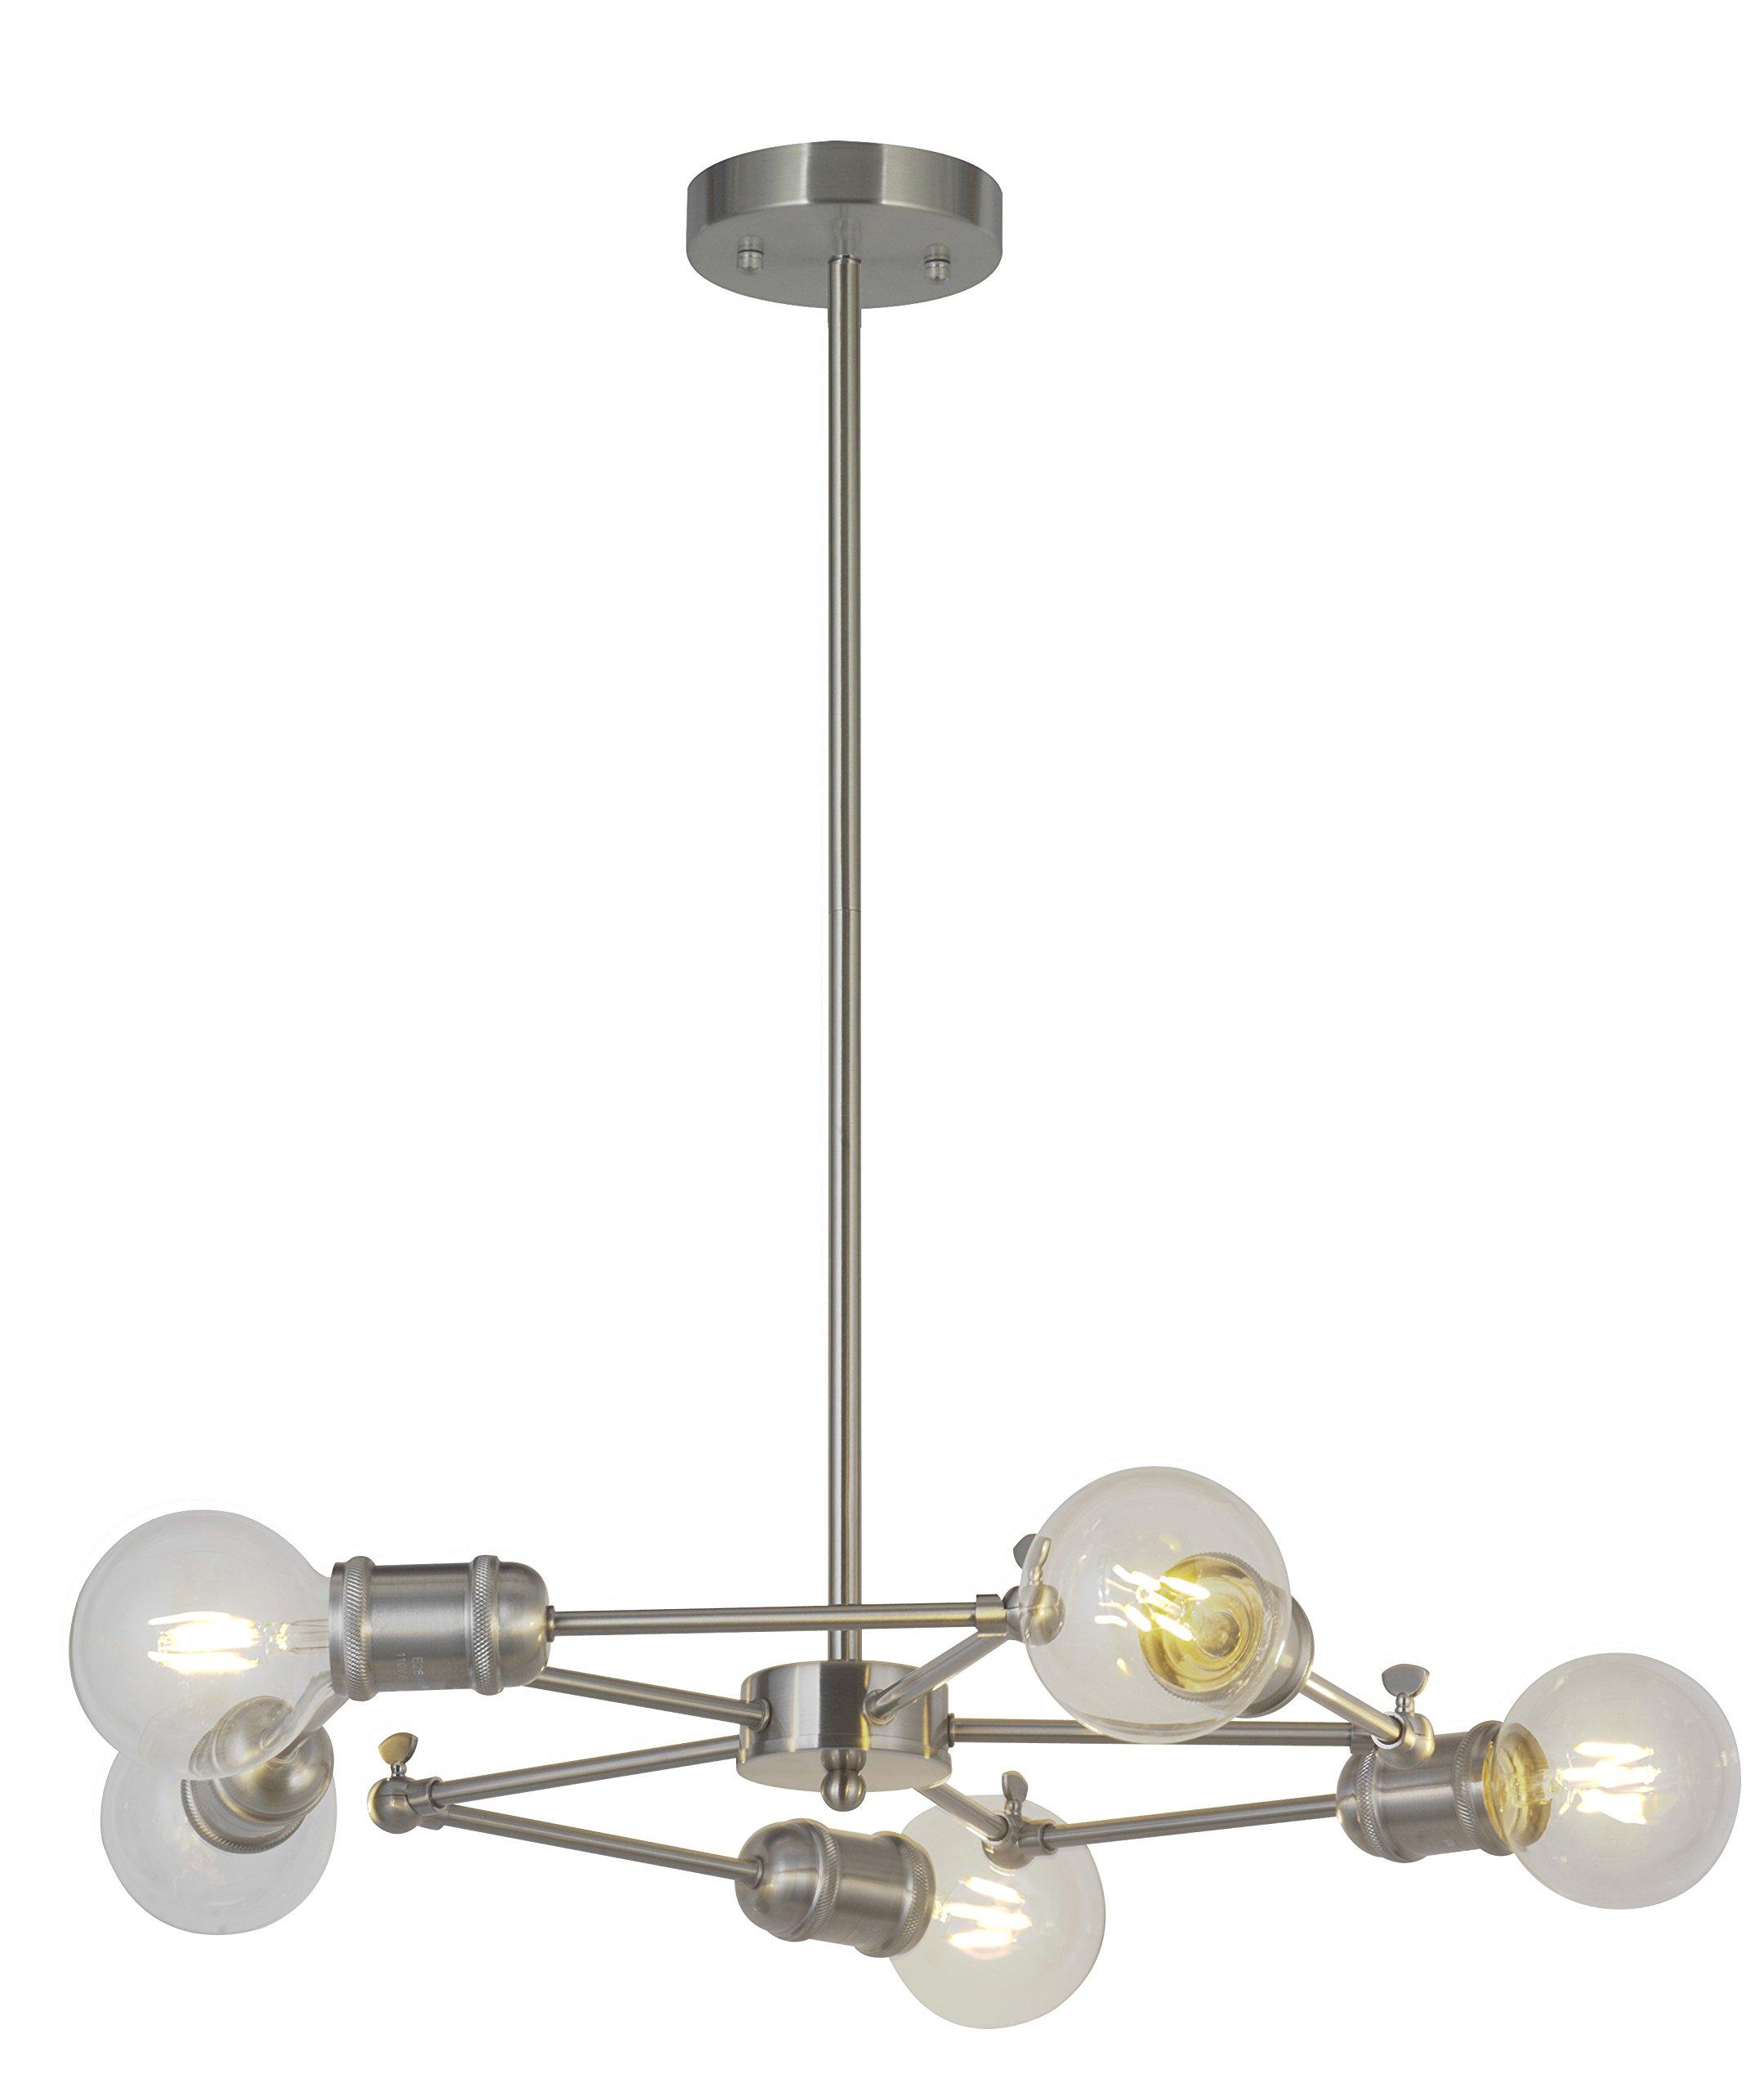 Image of: Buy Vinluz Sputnik Chandelier Lighting 5 Lights Brushed Nickel Mid Century Modern Chandeliers Ceiling Kitchen Lights Fixtures Ul Listed In Cheap Price On Alibaba Com